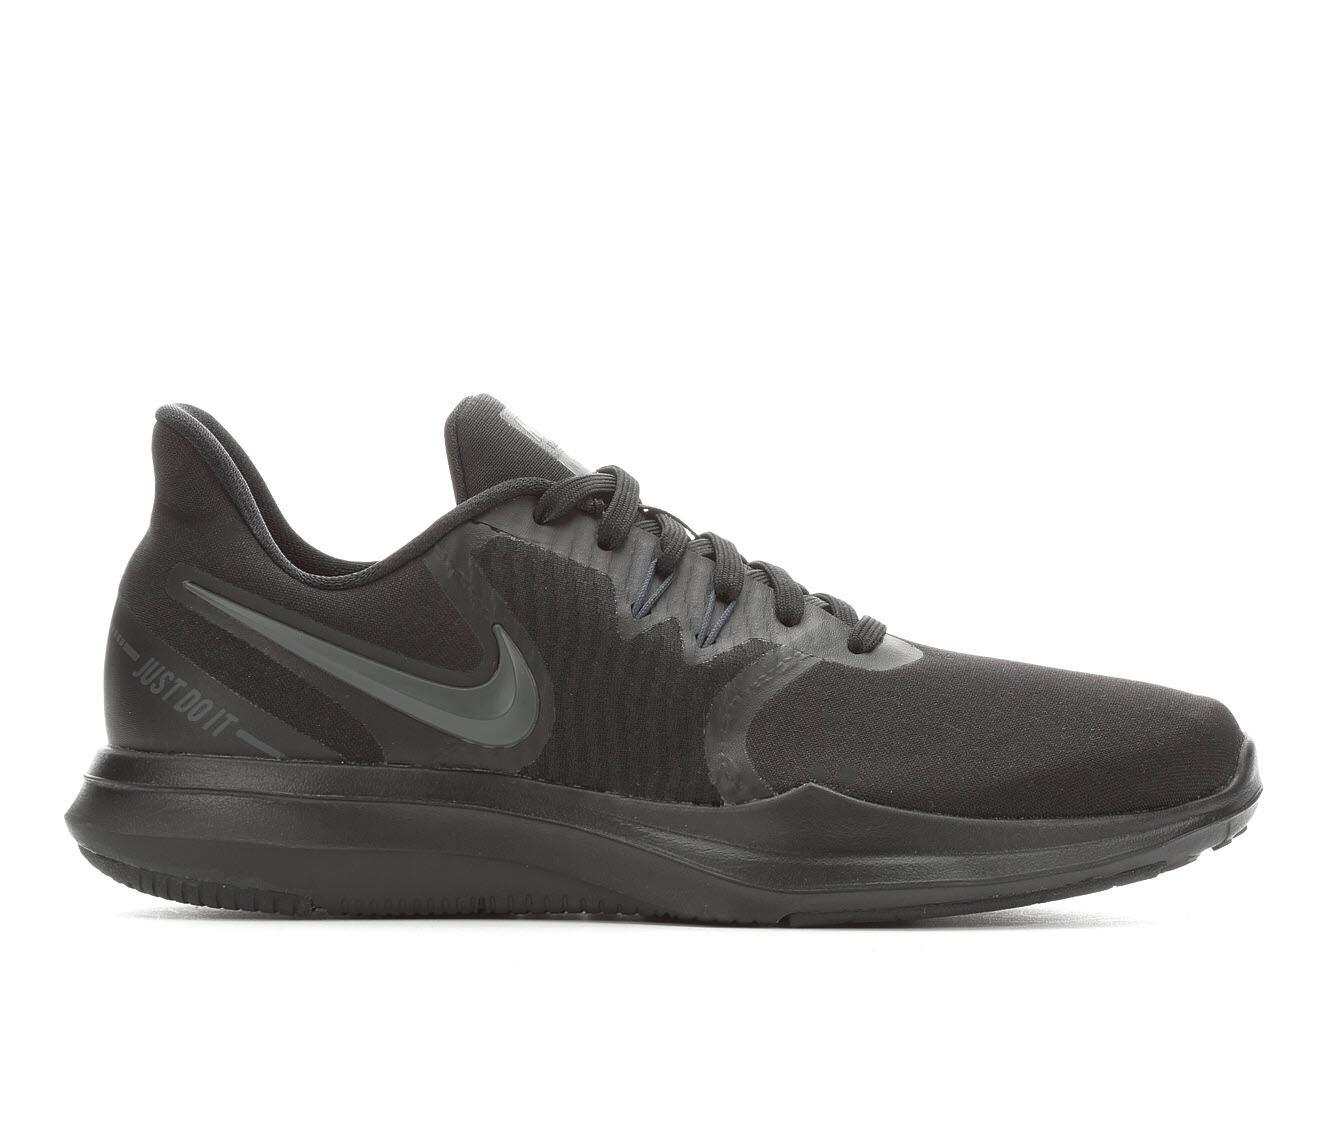 Women's Nike In-Season TR 8 Training Shoes Black/Anthracit